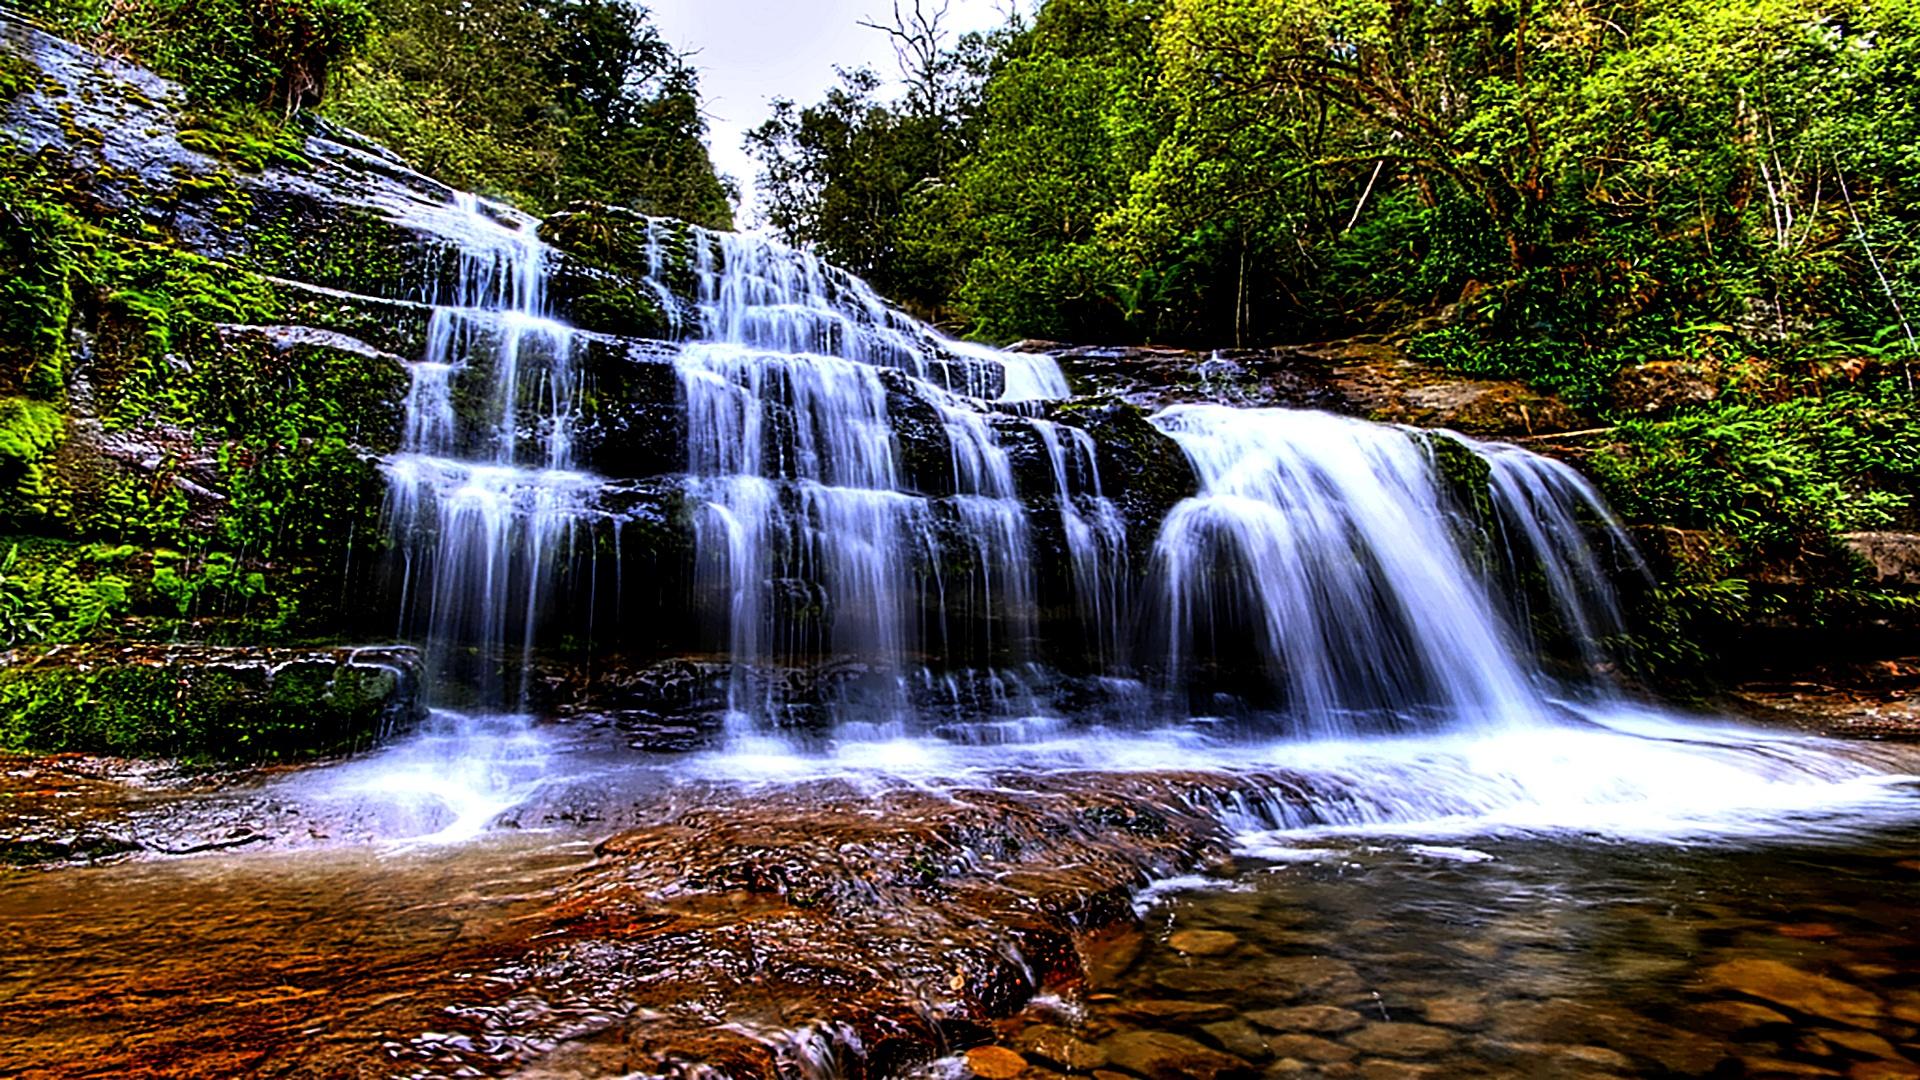 Waterfall Live Wallpaper Download 1920x1080